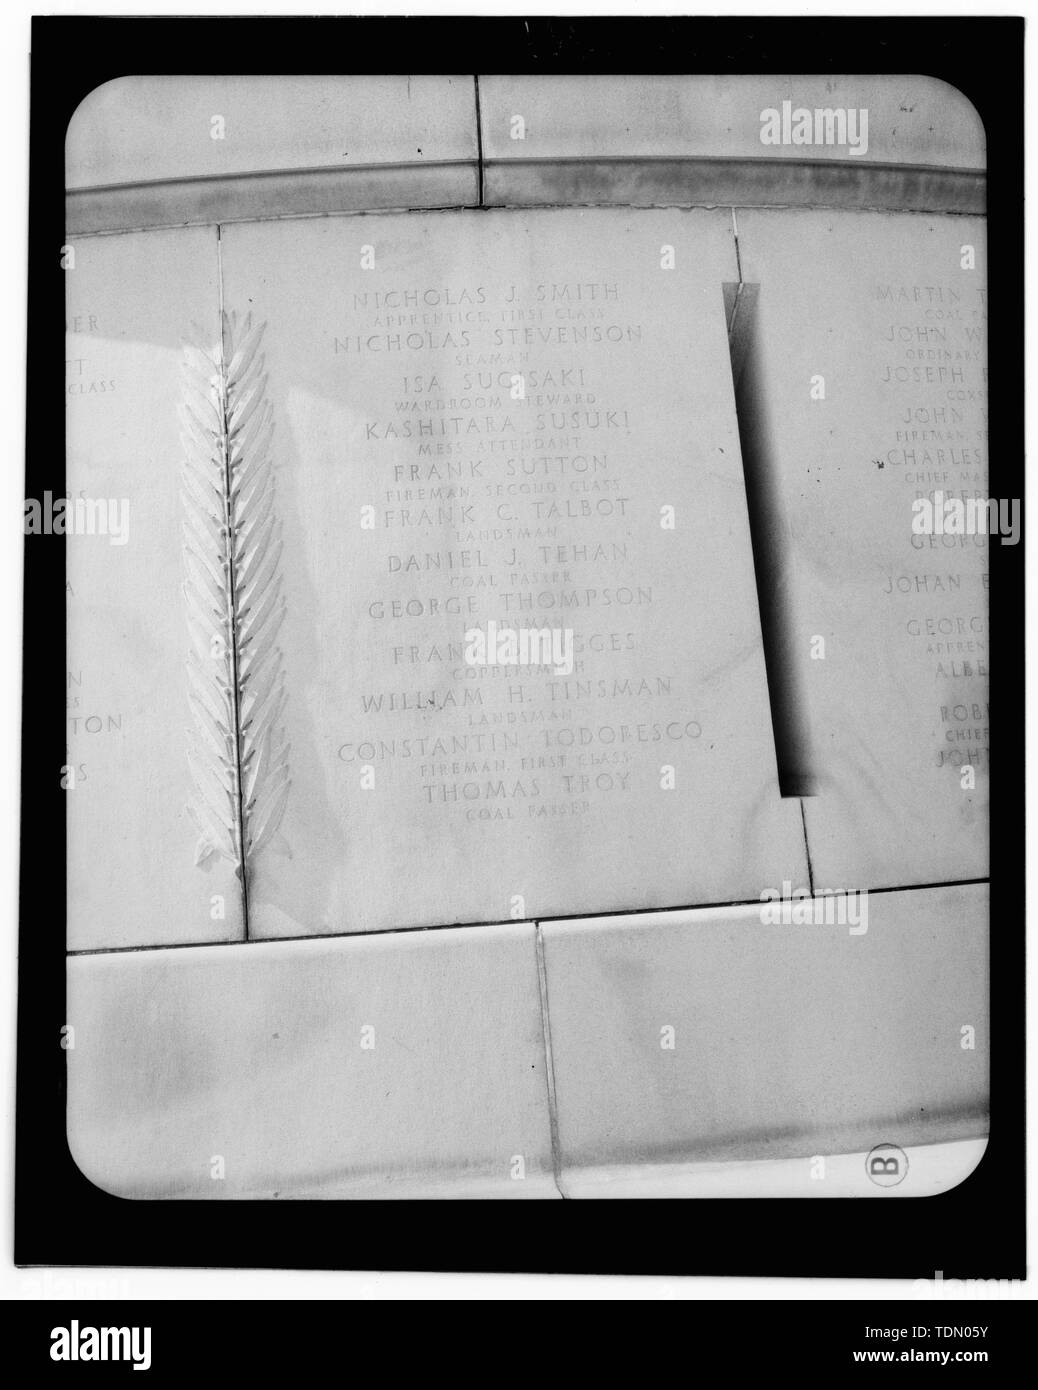 Panel 21 - Arlington National Cemetery, USS Maine Memorial, Arlington, Arlington County, VA; U.S. Army Corps of Engineers; Wyeth, Nathan C; Black, William M; Patrick, Mason M; Ferguson, H B; Bixby, W H; Goodson, W F; Lackawanna Steel Company; T.L. Huston Construction Company; Harris Brothers; Clark, D Lombillo; Primelles, Arturo; Rhodes, D H; Jenkins, Oliver B; Tilford, James D; Aleshire, J B; Stimson, H E; Scofield, John J; Hugh, R P; Houston, J B; Sharpe, Henry G; Downey, G F; Clem, L; Cosby, Spencer; Taft, William Howard; Commission of Fine Arts; Olmsted, Fredrick Law; French, Daniel Cheste - Stock Image